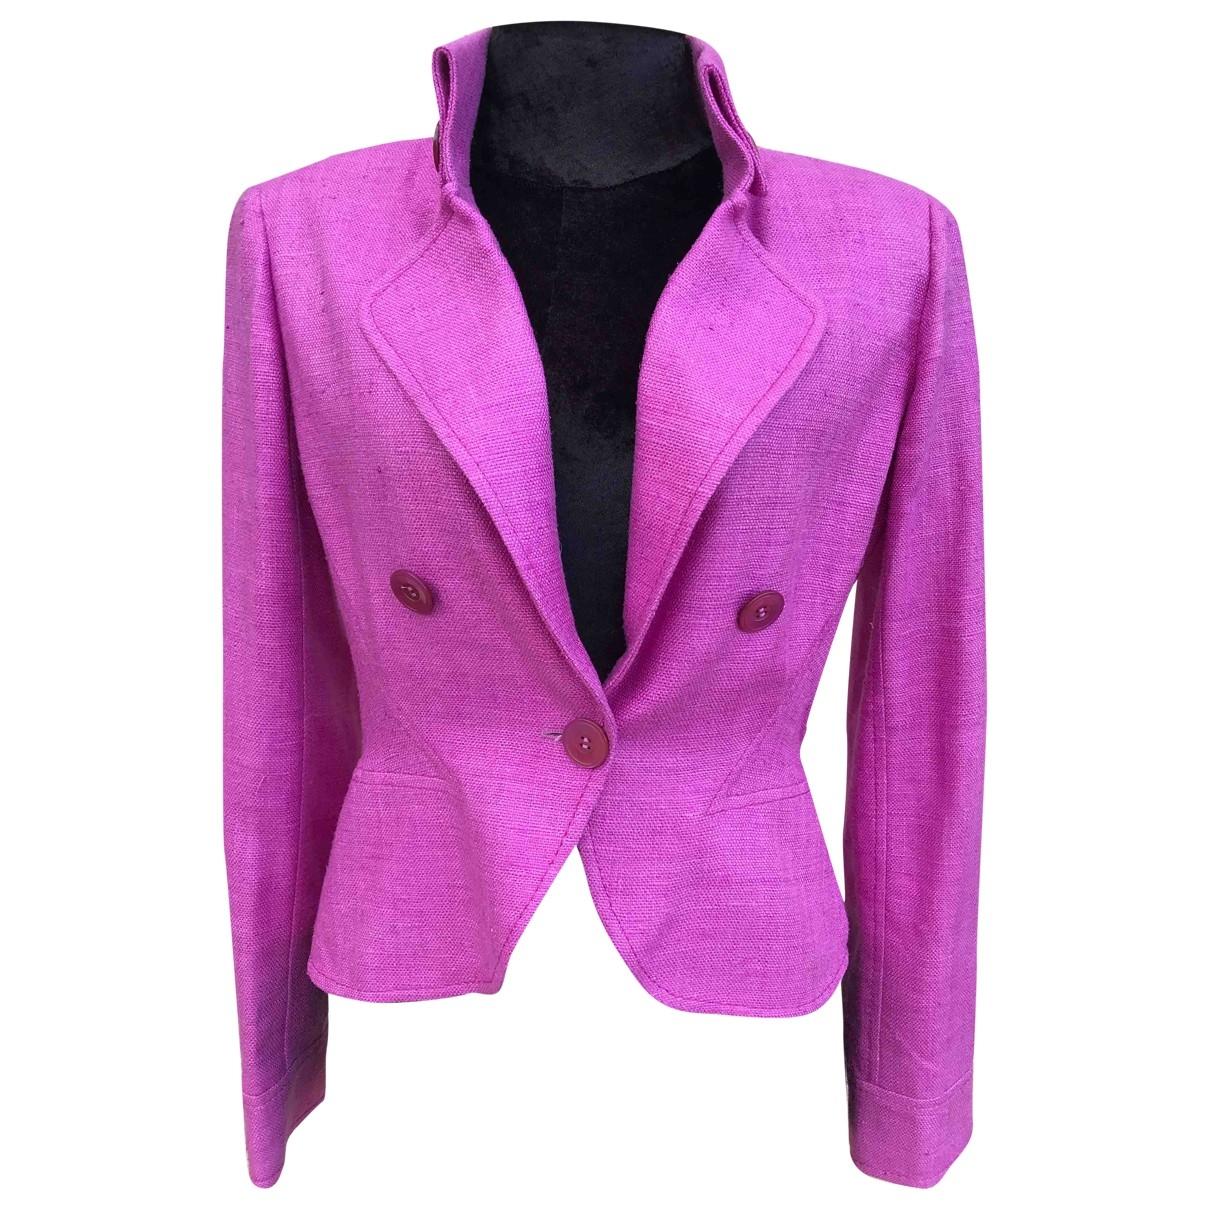 Valentino Garavani \N Pink jacket for Women 8 UK